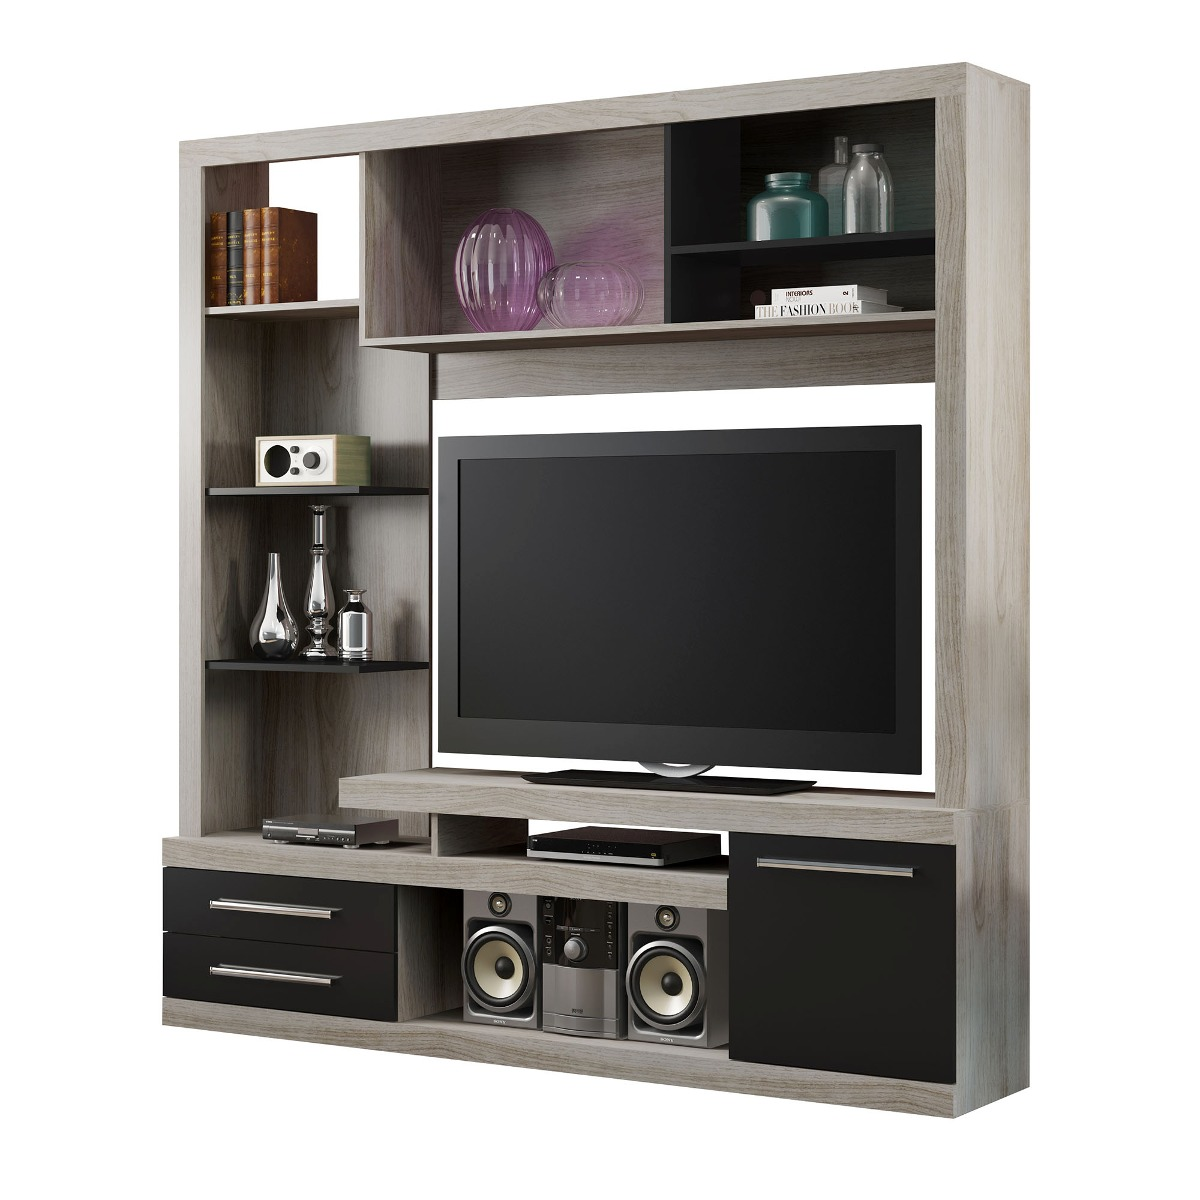 Mueble Para Tv Home Rack Modelo 944 Rinnova 184 900 En  # Muebles Rinnova